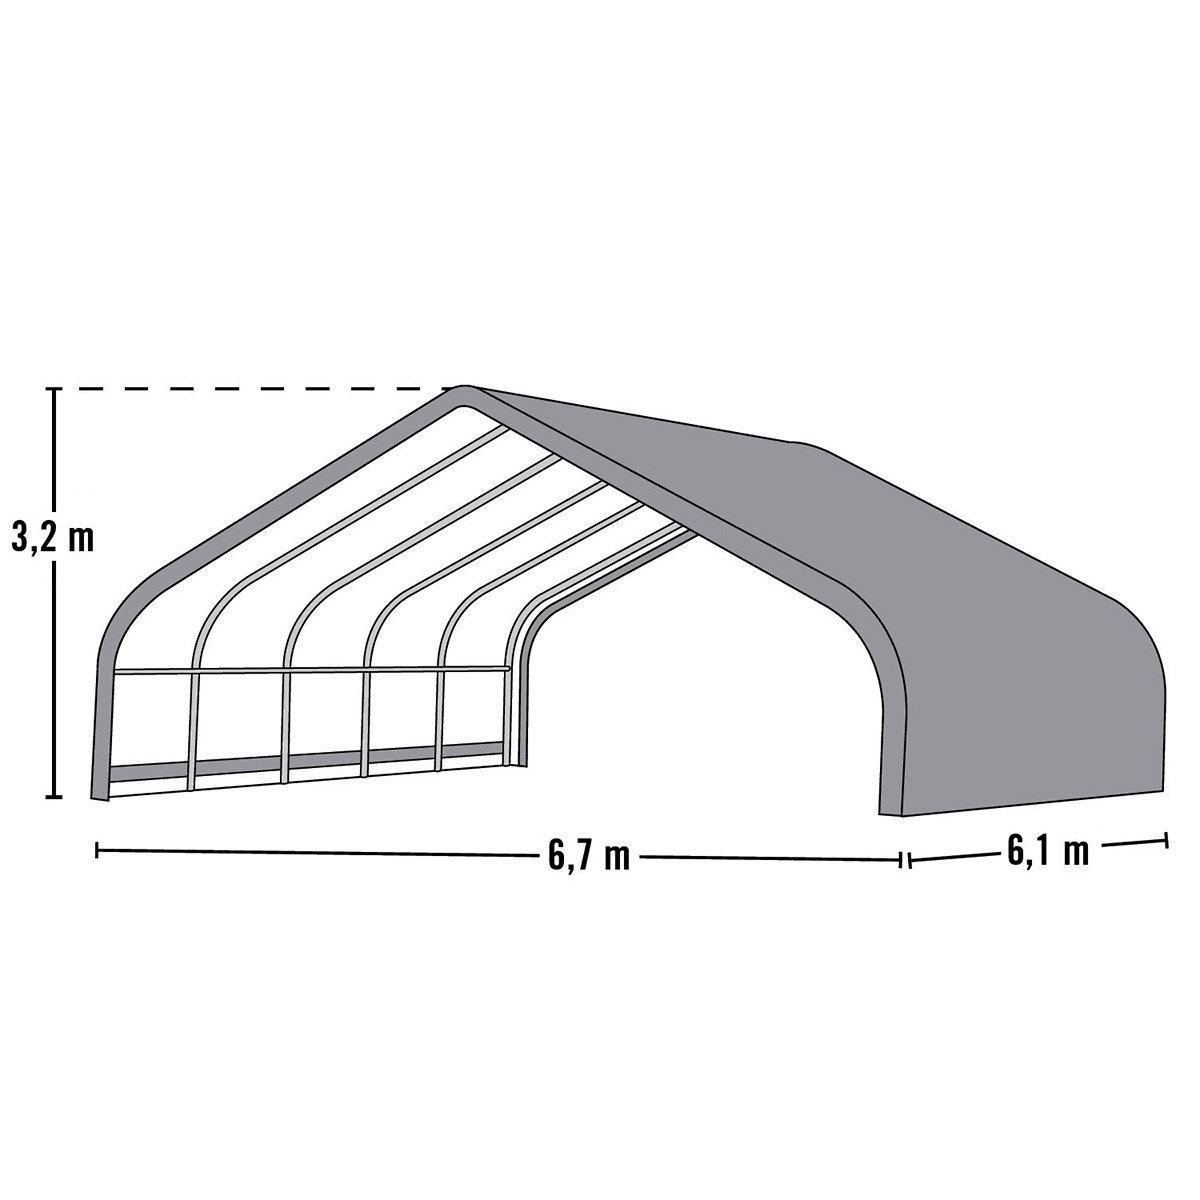 ShelterLogic Weidezelt Run-in-Shed 40,87m² inkl. Sturmanker   #6